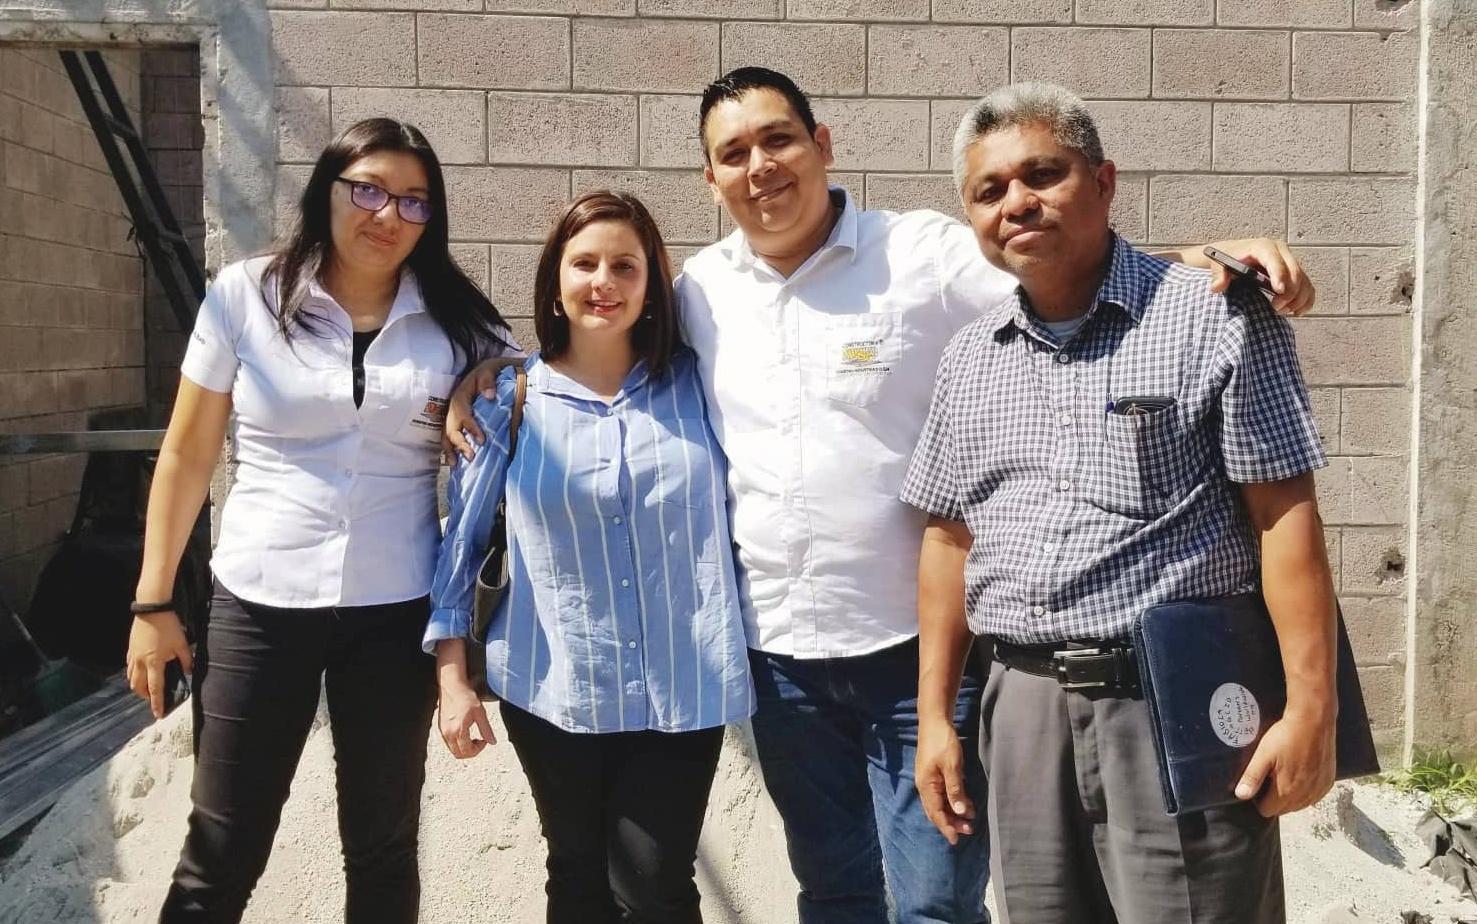 Yesenia, Partners Worldwide staff member Fabiola, Alex, and Pastor Chiacas